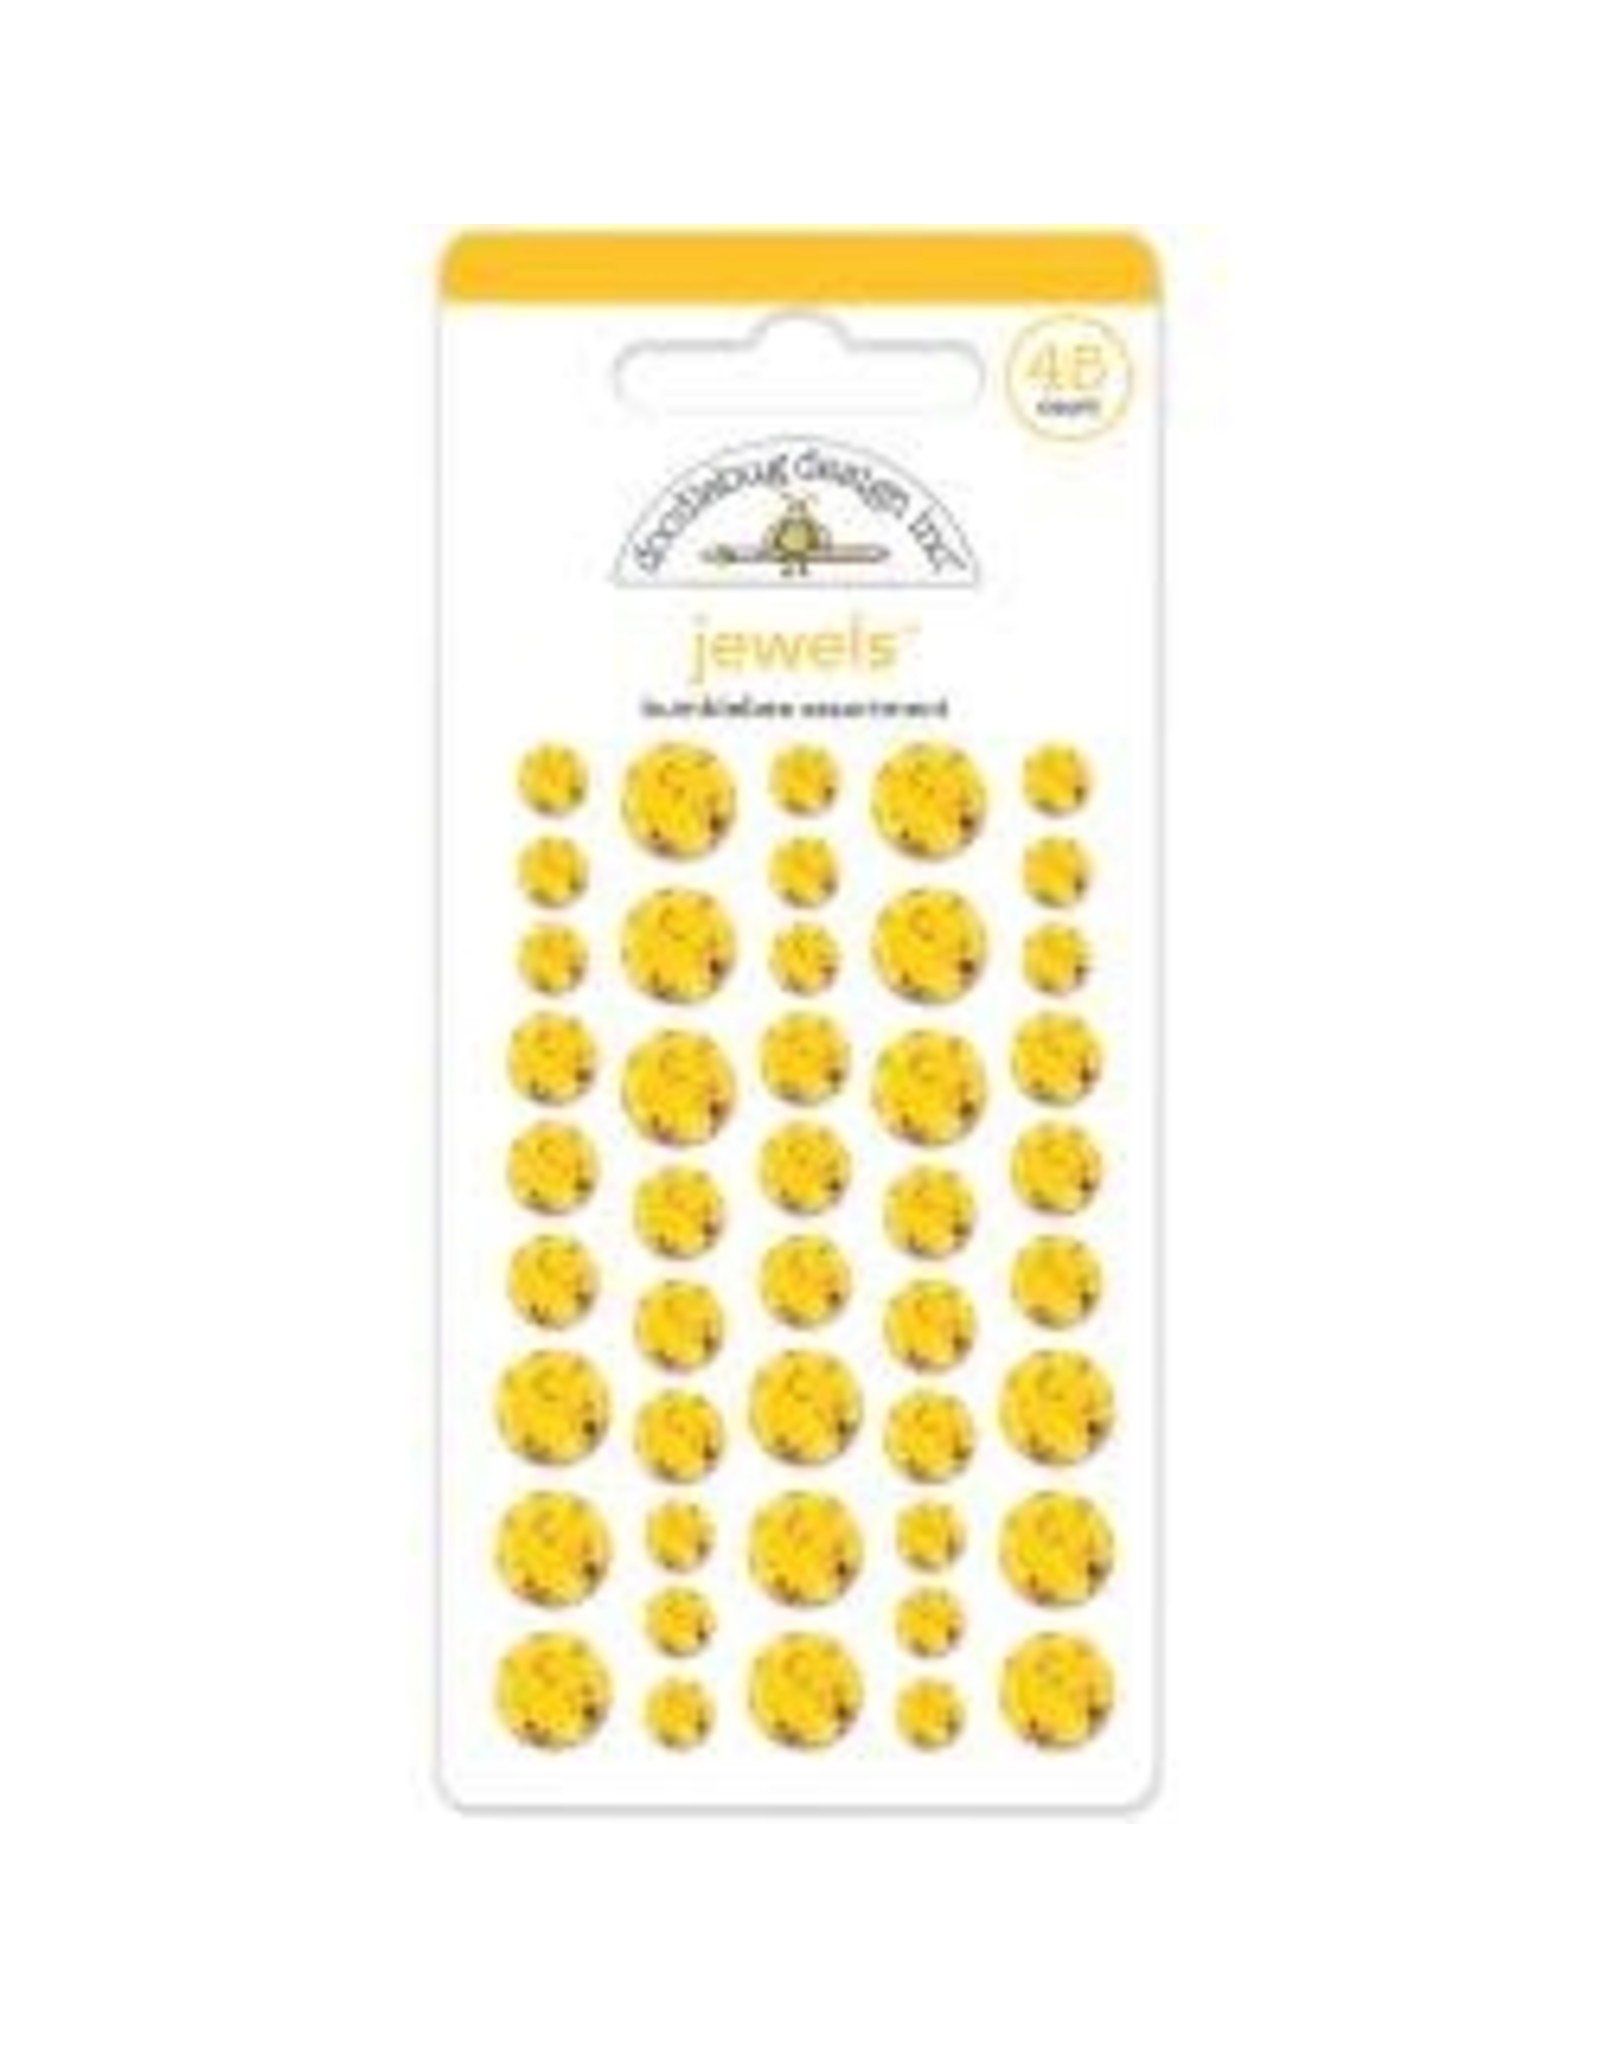 Doodlebug Design bumblebee assortment jewels